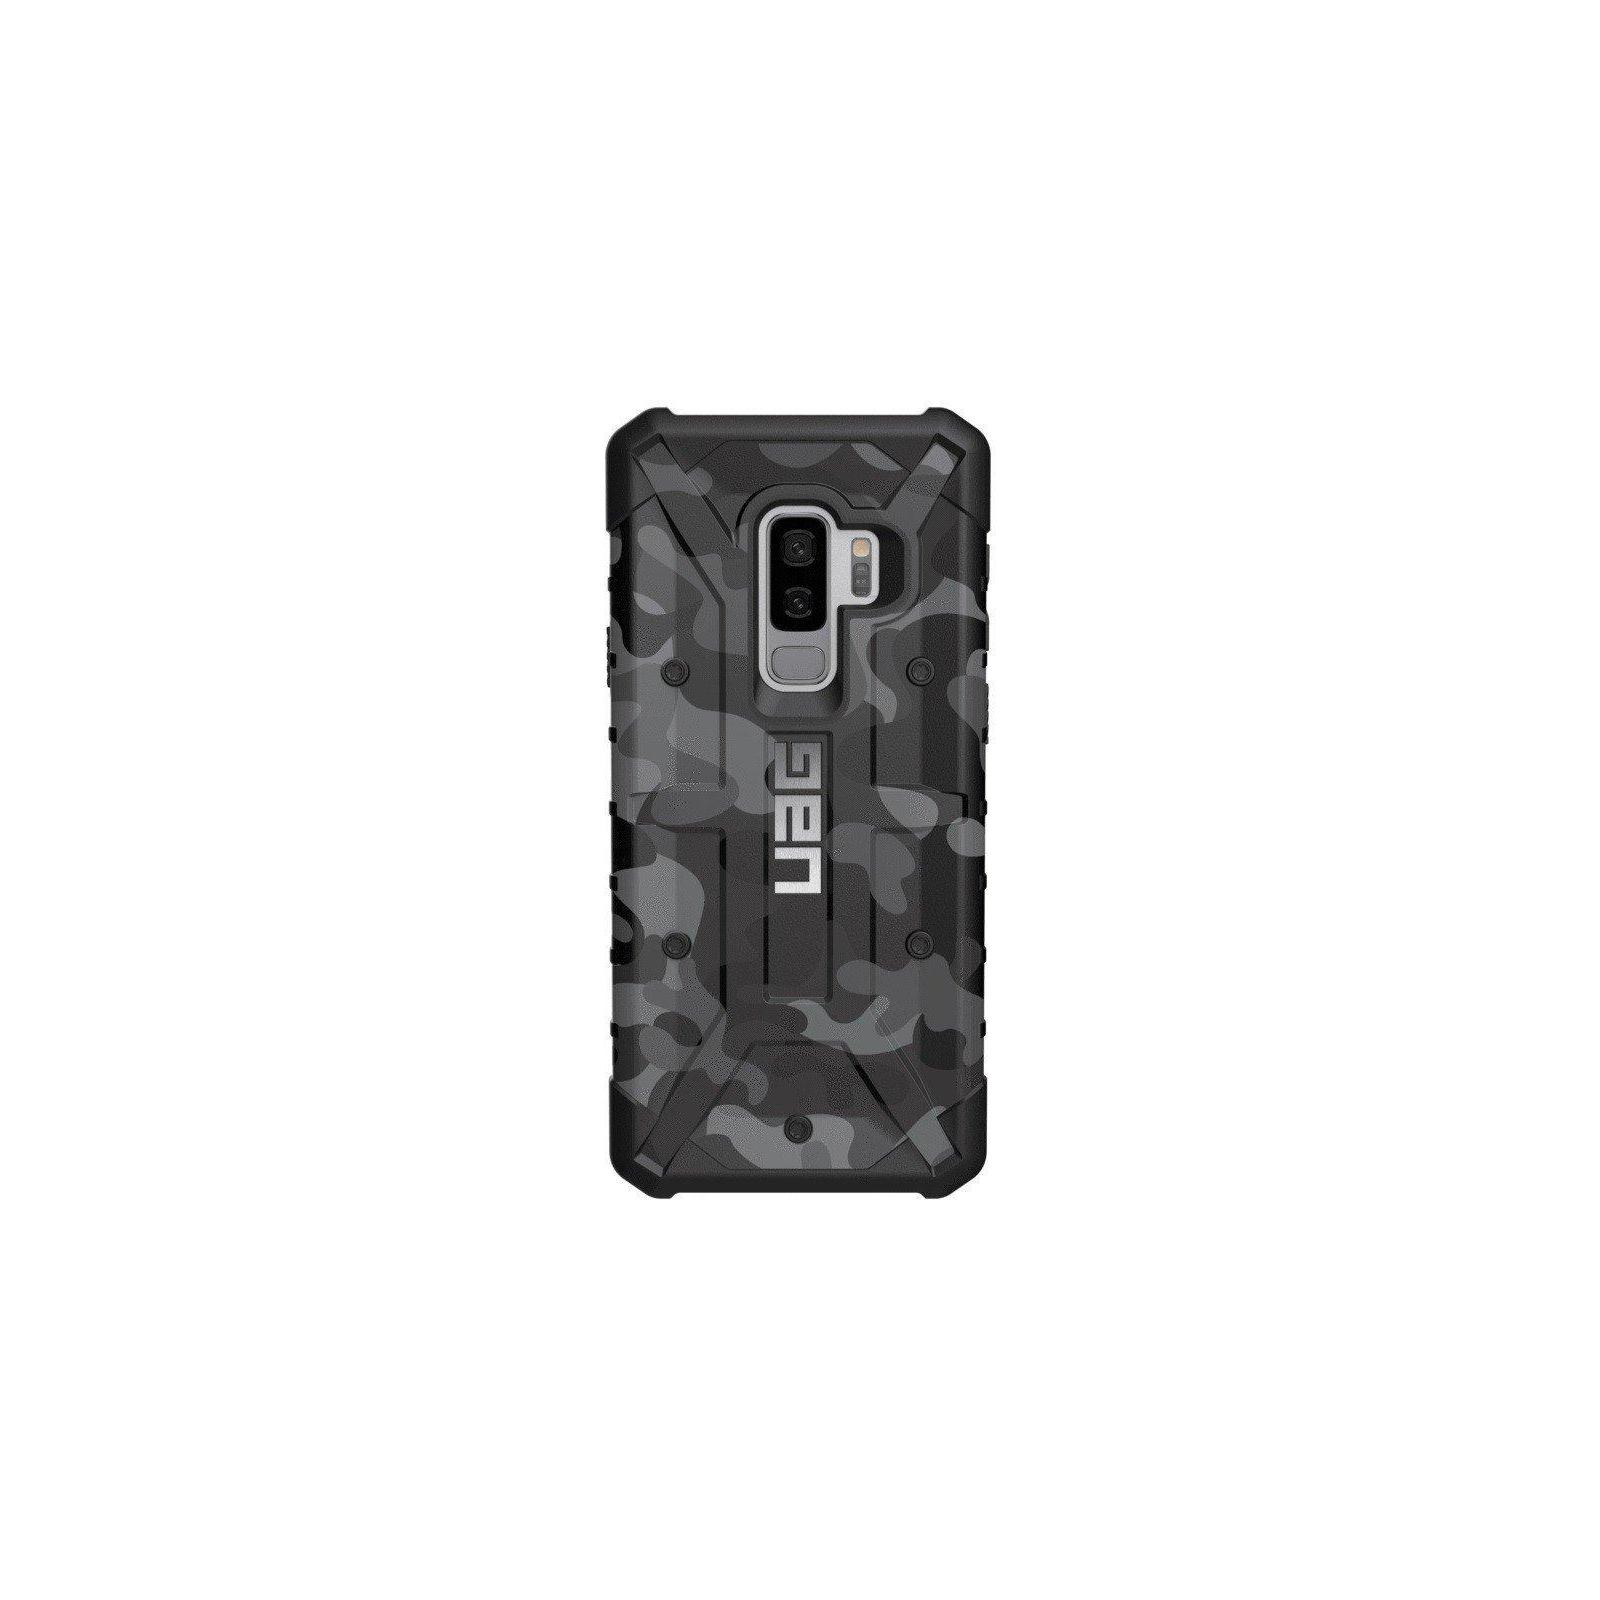 Чехол для моб. телефона Urban Armor Gear Galaxy S9+ Pathfinder Camo Gray/Black (GLXS9PLS-A-BC)